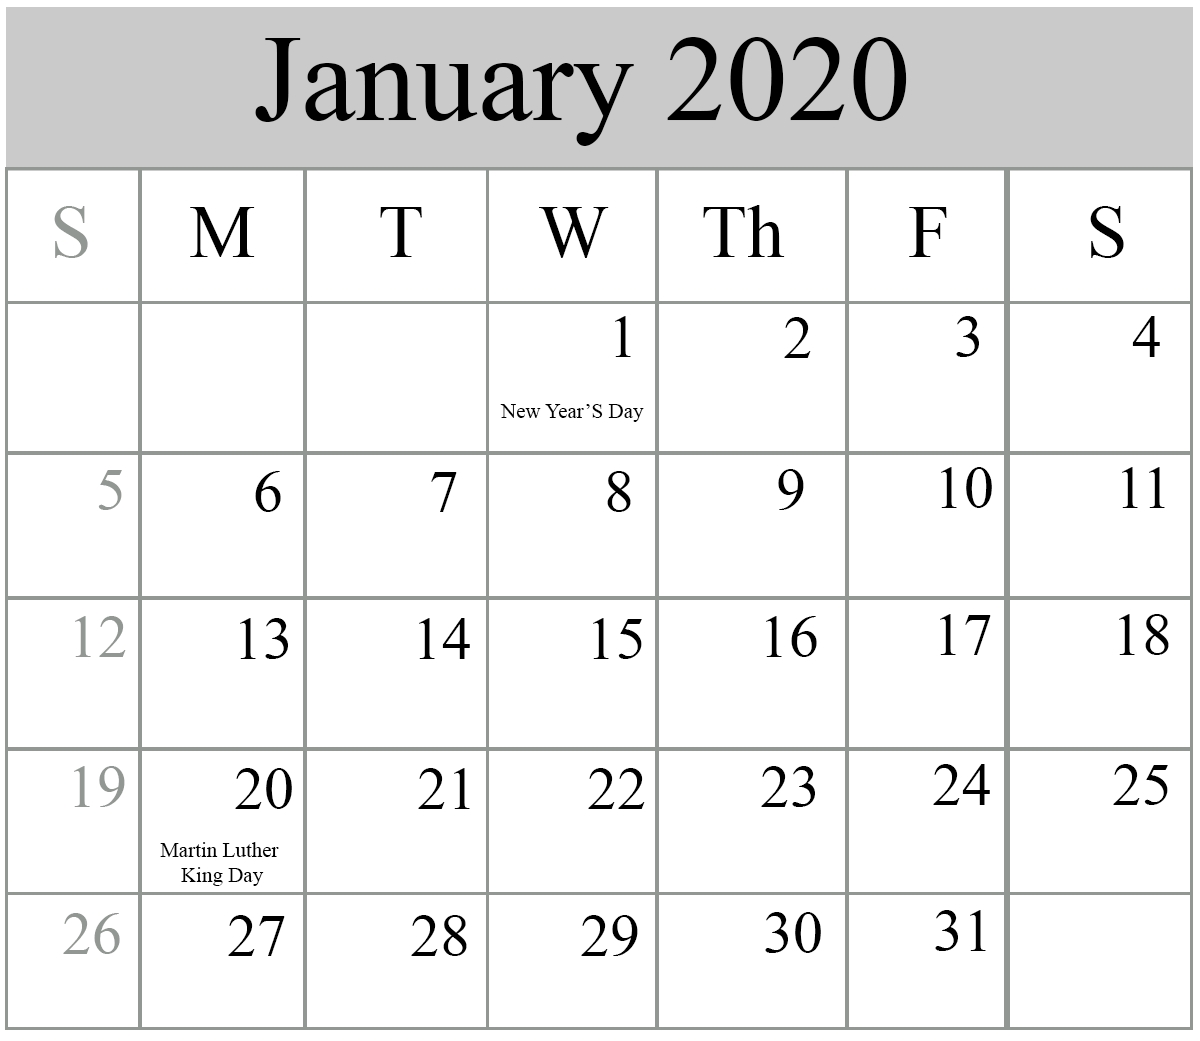 Free January 2020 Calendar Printable Templates {Pdf, Excel, Word within Printable 2020 Calendar I Can Edit